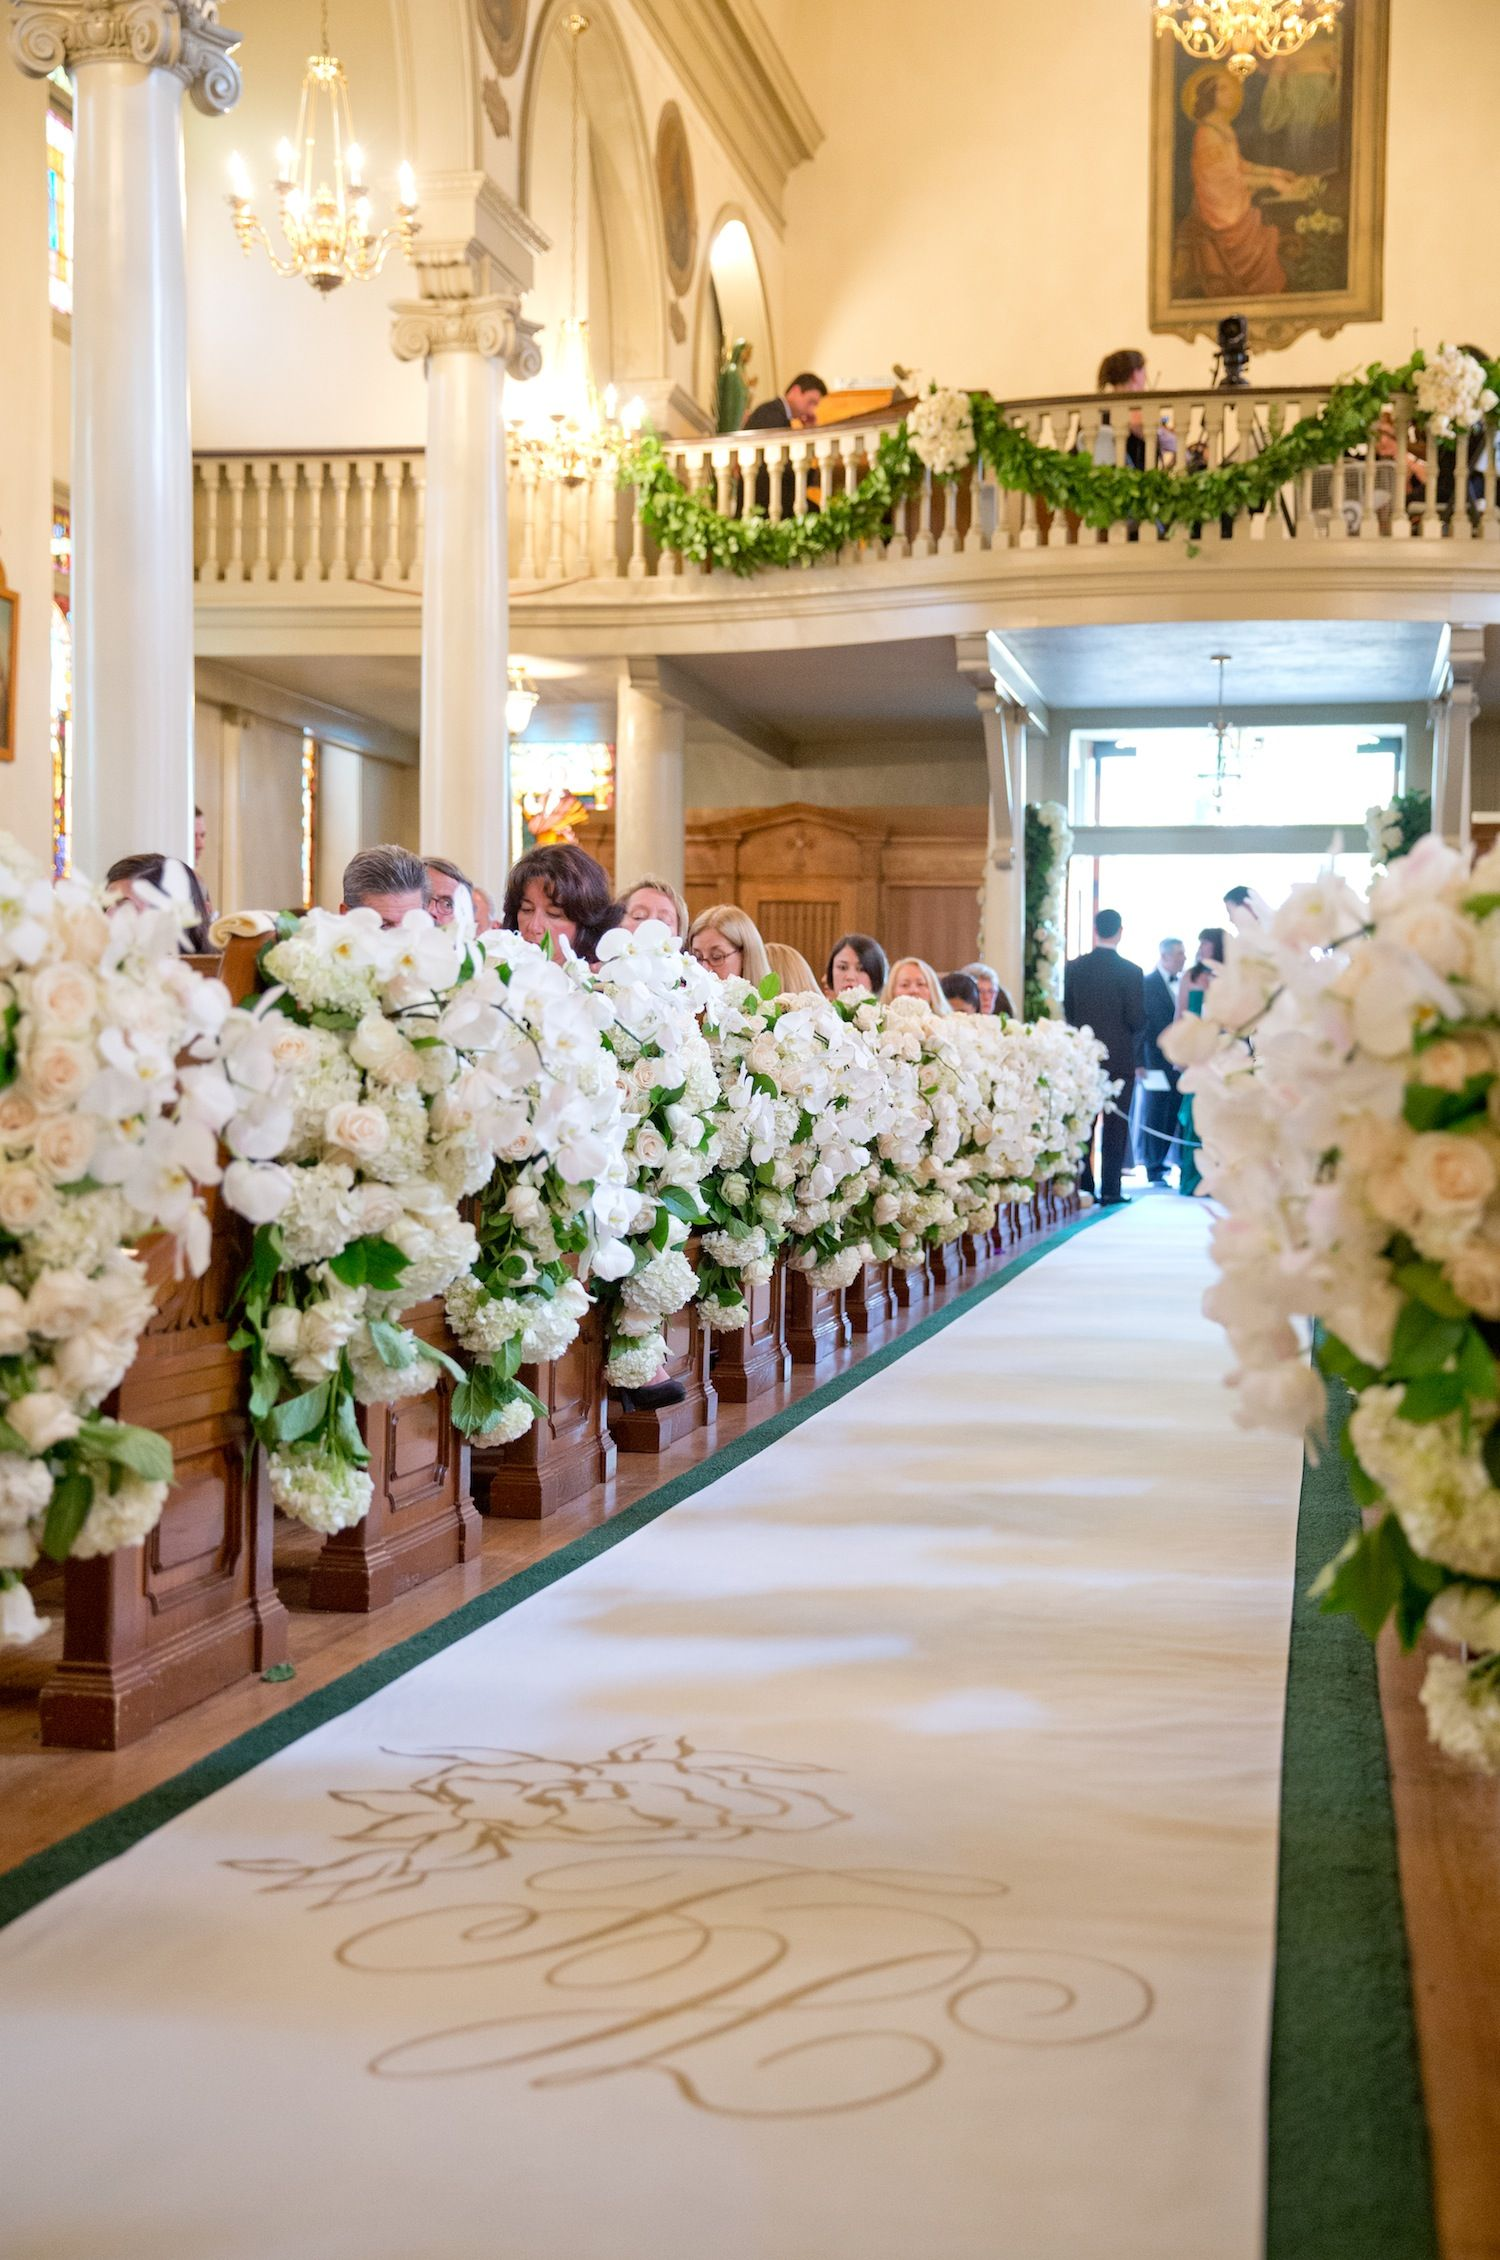 White wedding decor ideas   Beautiful Décor Ideas for a Church Wedding  Wedding Flowers